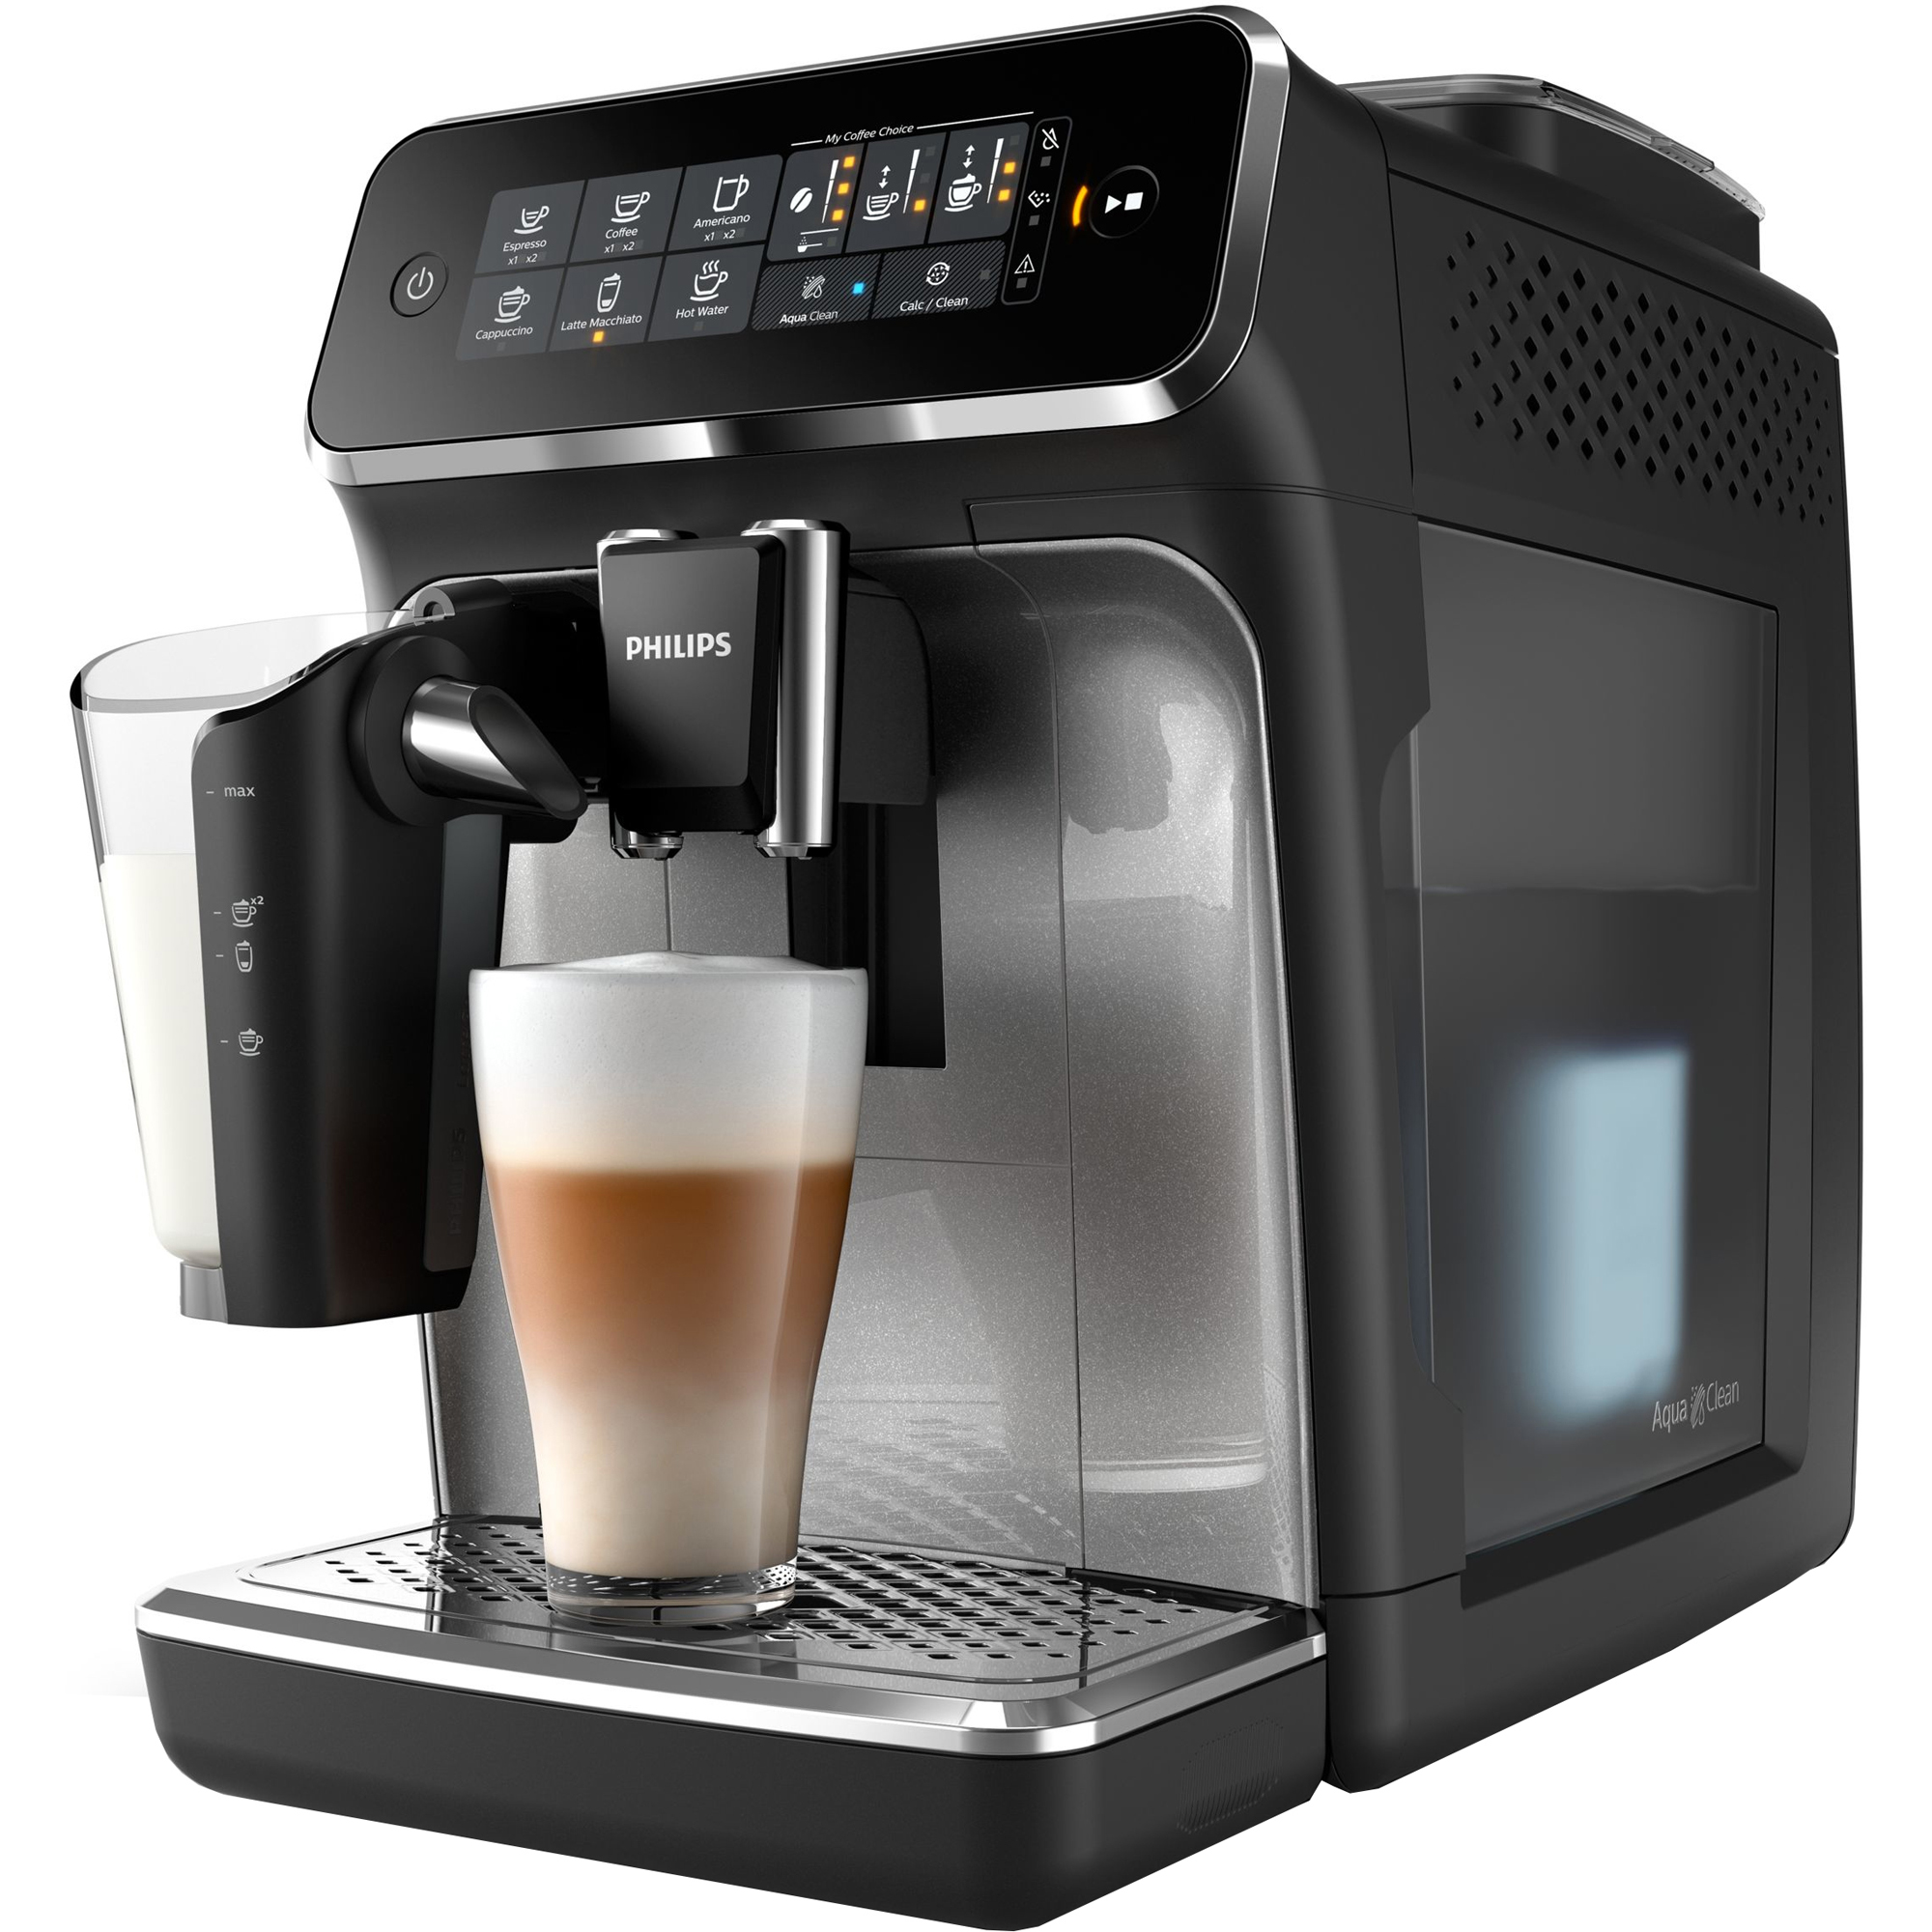 Кофемашина Philips LatteGo EP3246/70 кофемашина автоматическая philips ep 5030 10 series 5000 lattego